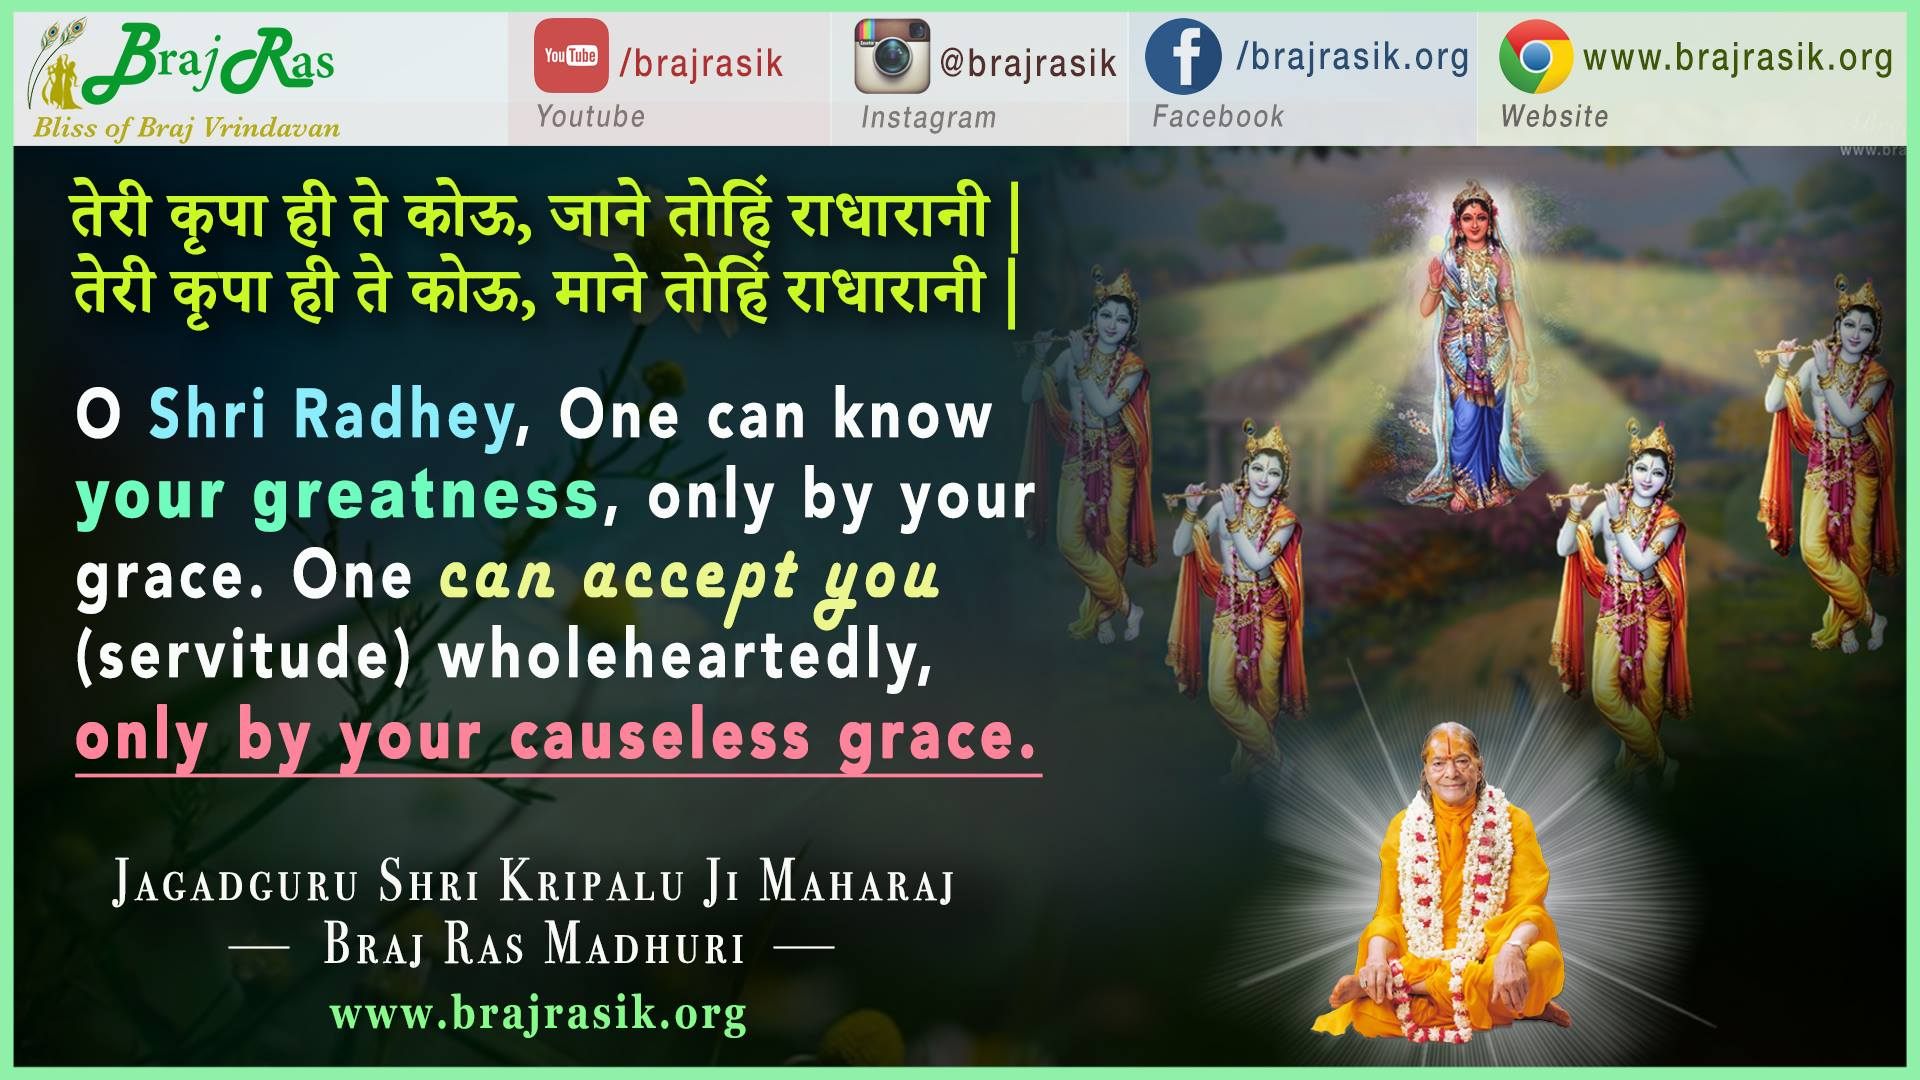 Teri Kripa Hi Te Kou - Jagadguru Shri Kripalu Ji Maharaj, Braj Ras Madhuri